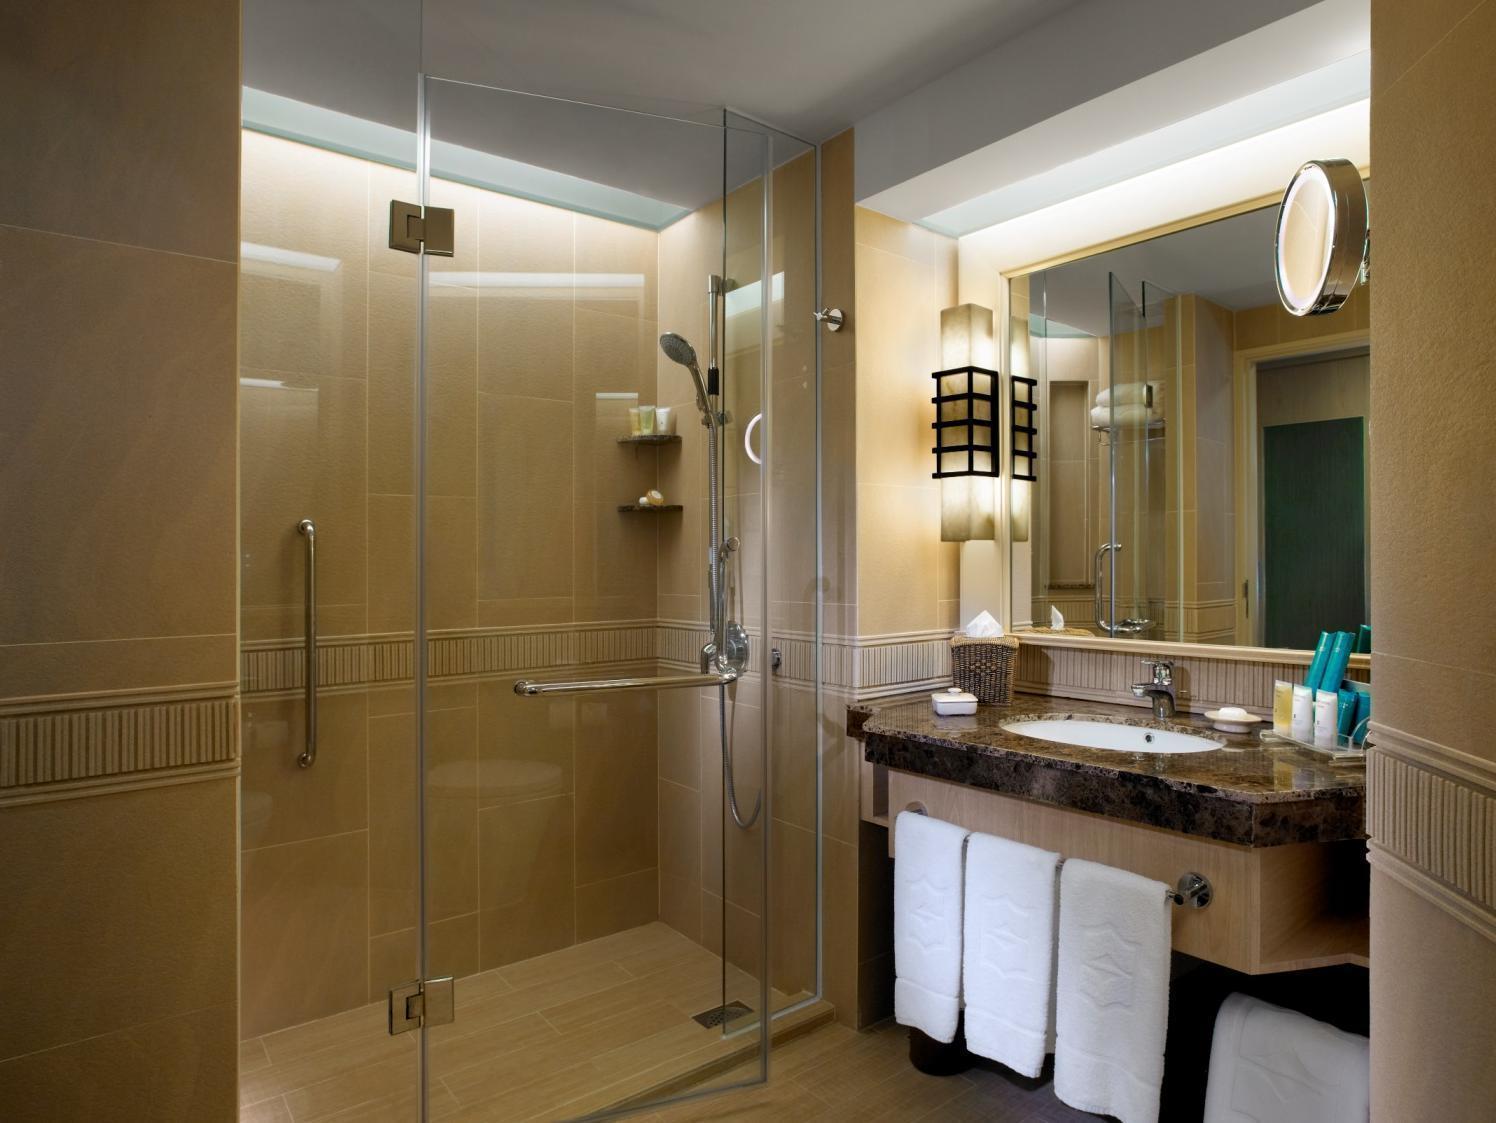 Bathroom Accessories Kota Kinabalu best price on shangri-la's rasa ria resort & spa in kota kinabalu